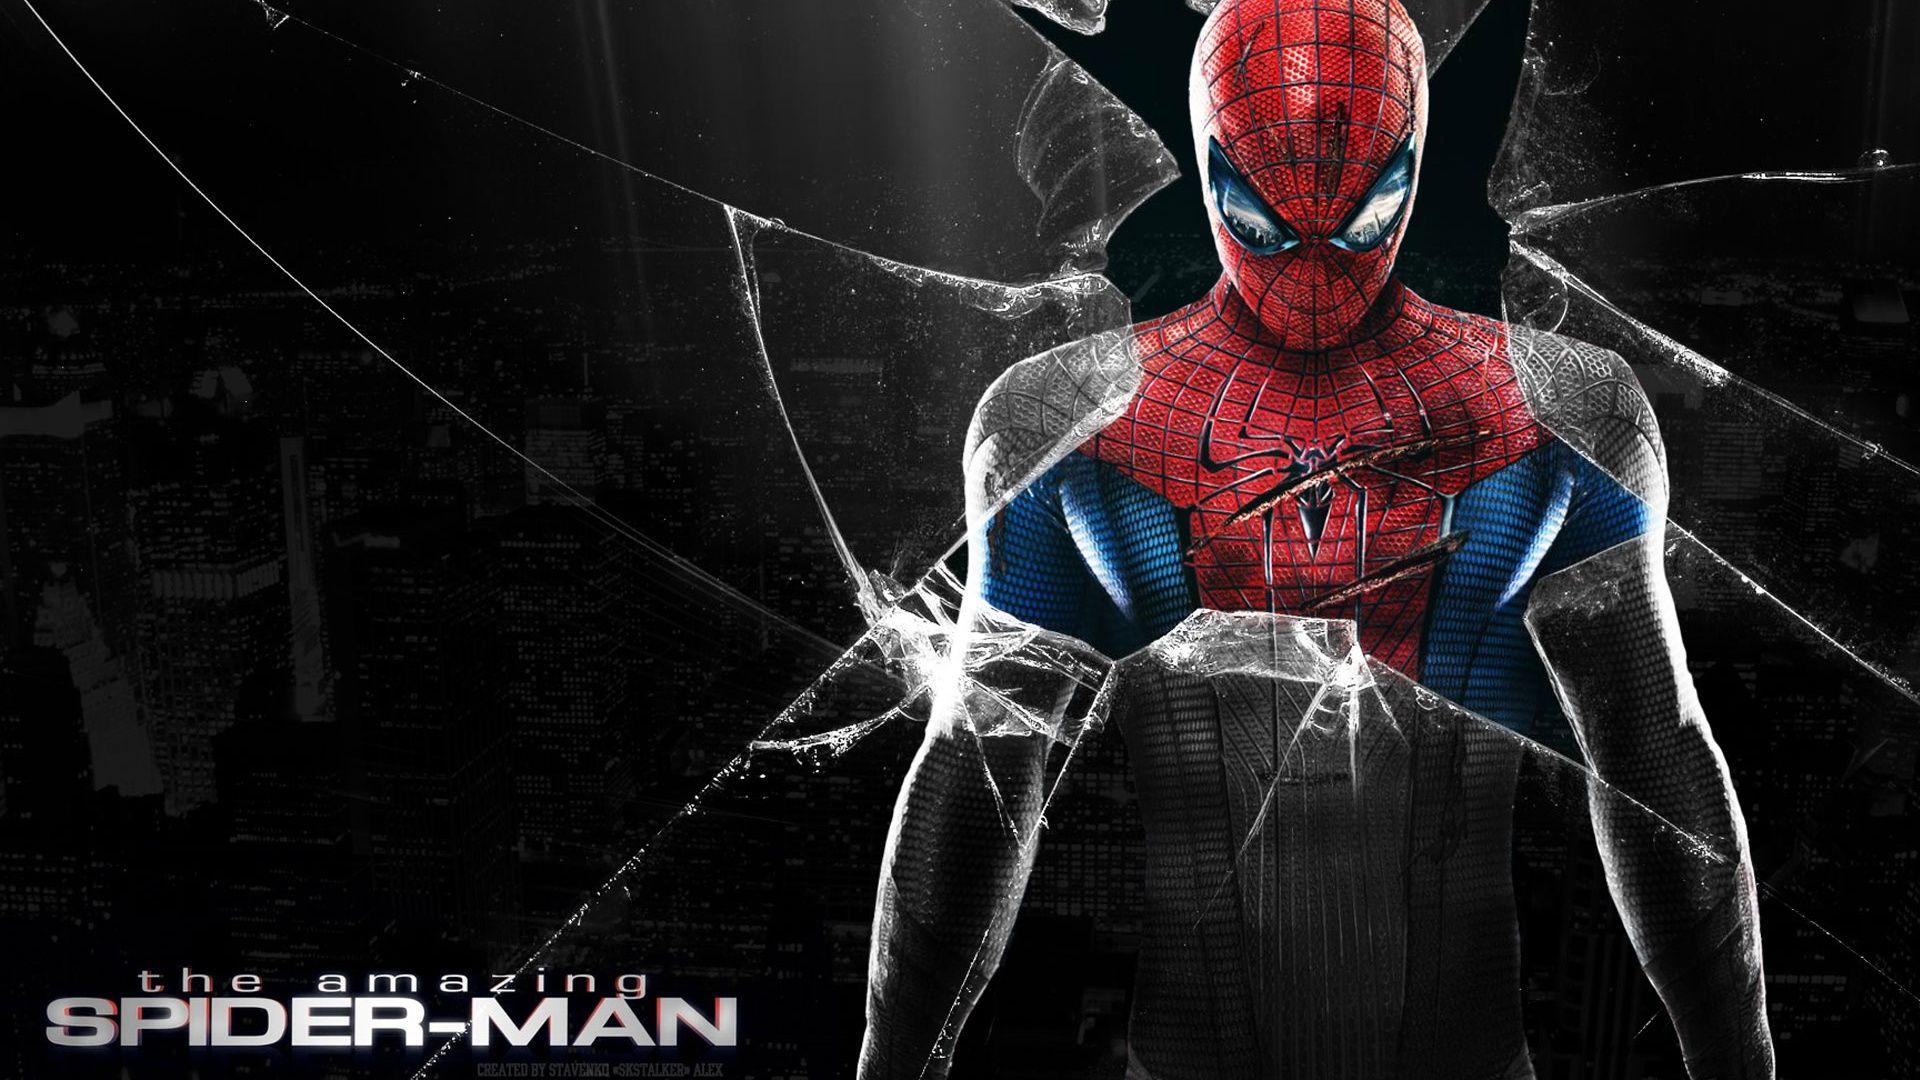 Most Inspiring Wallpaper Home Screen Spiderman - 7446063ceb43544048b865e1f8b76ebe  Trends_711320.jpg